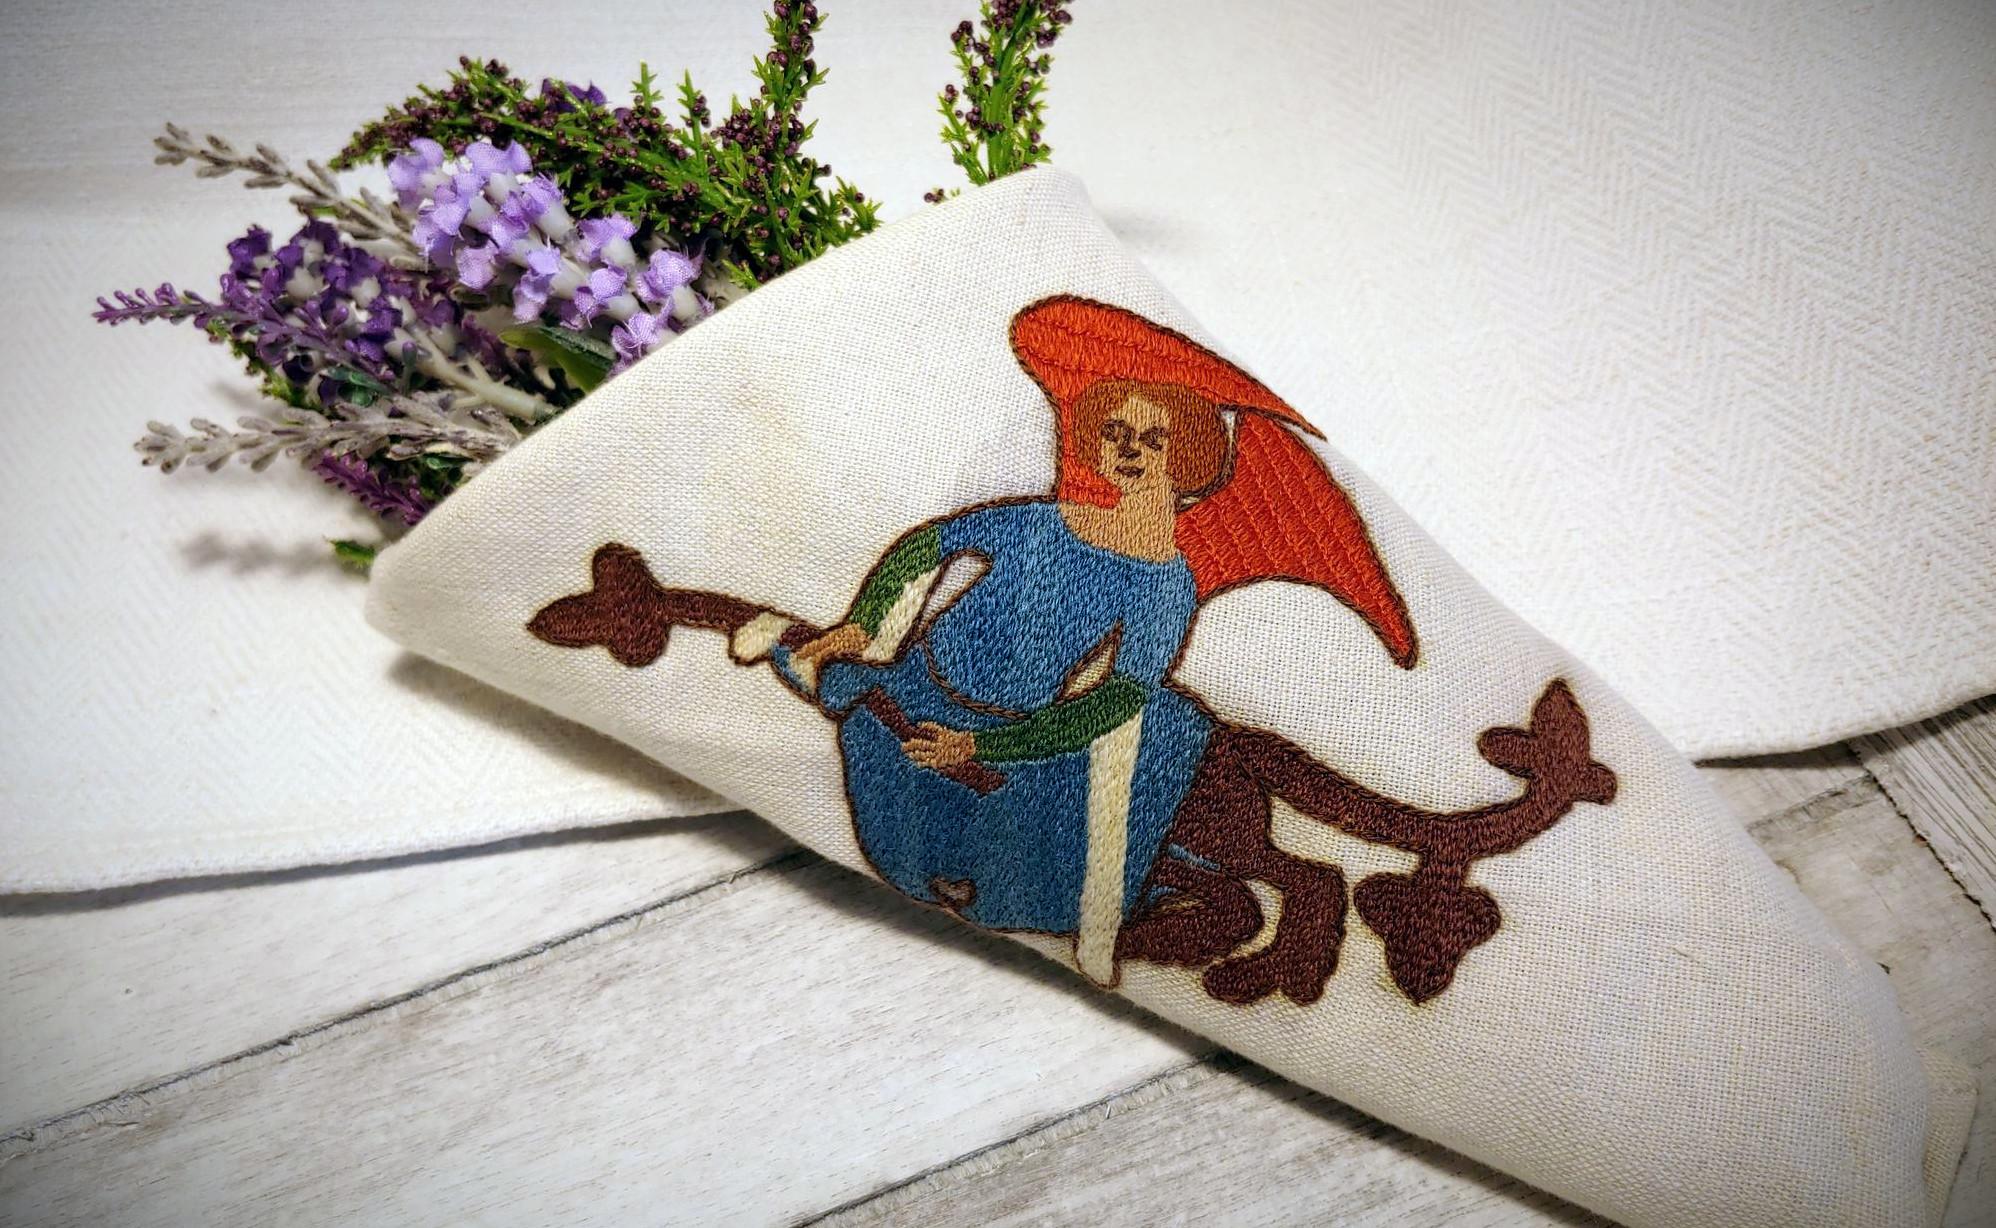 medieval, embroidery, living history, stickerei, historisch, klosterstich, cloister stitch, pflanzengefärbte wolle,  historische, embroidered,  Mittelalter, mittelalterliche, historische, Stickerei, Sticktechnik, middle ages, Anlegetechnik, couched, couching